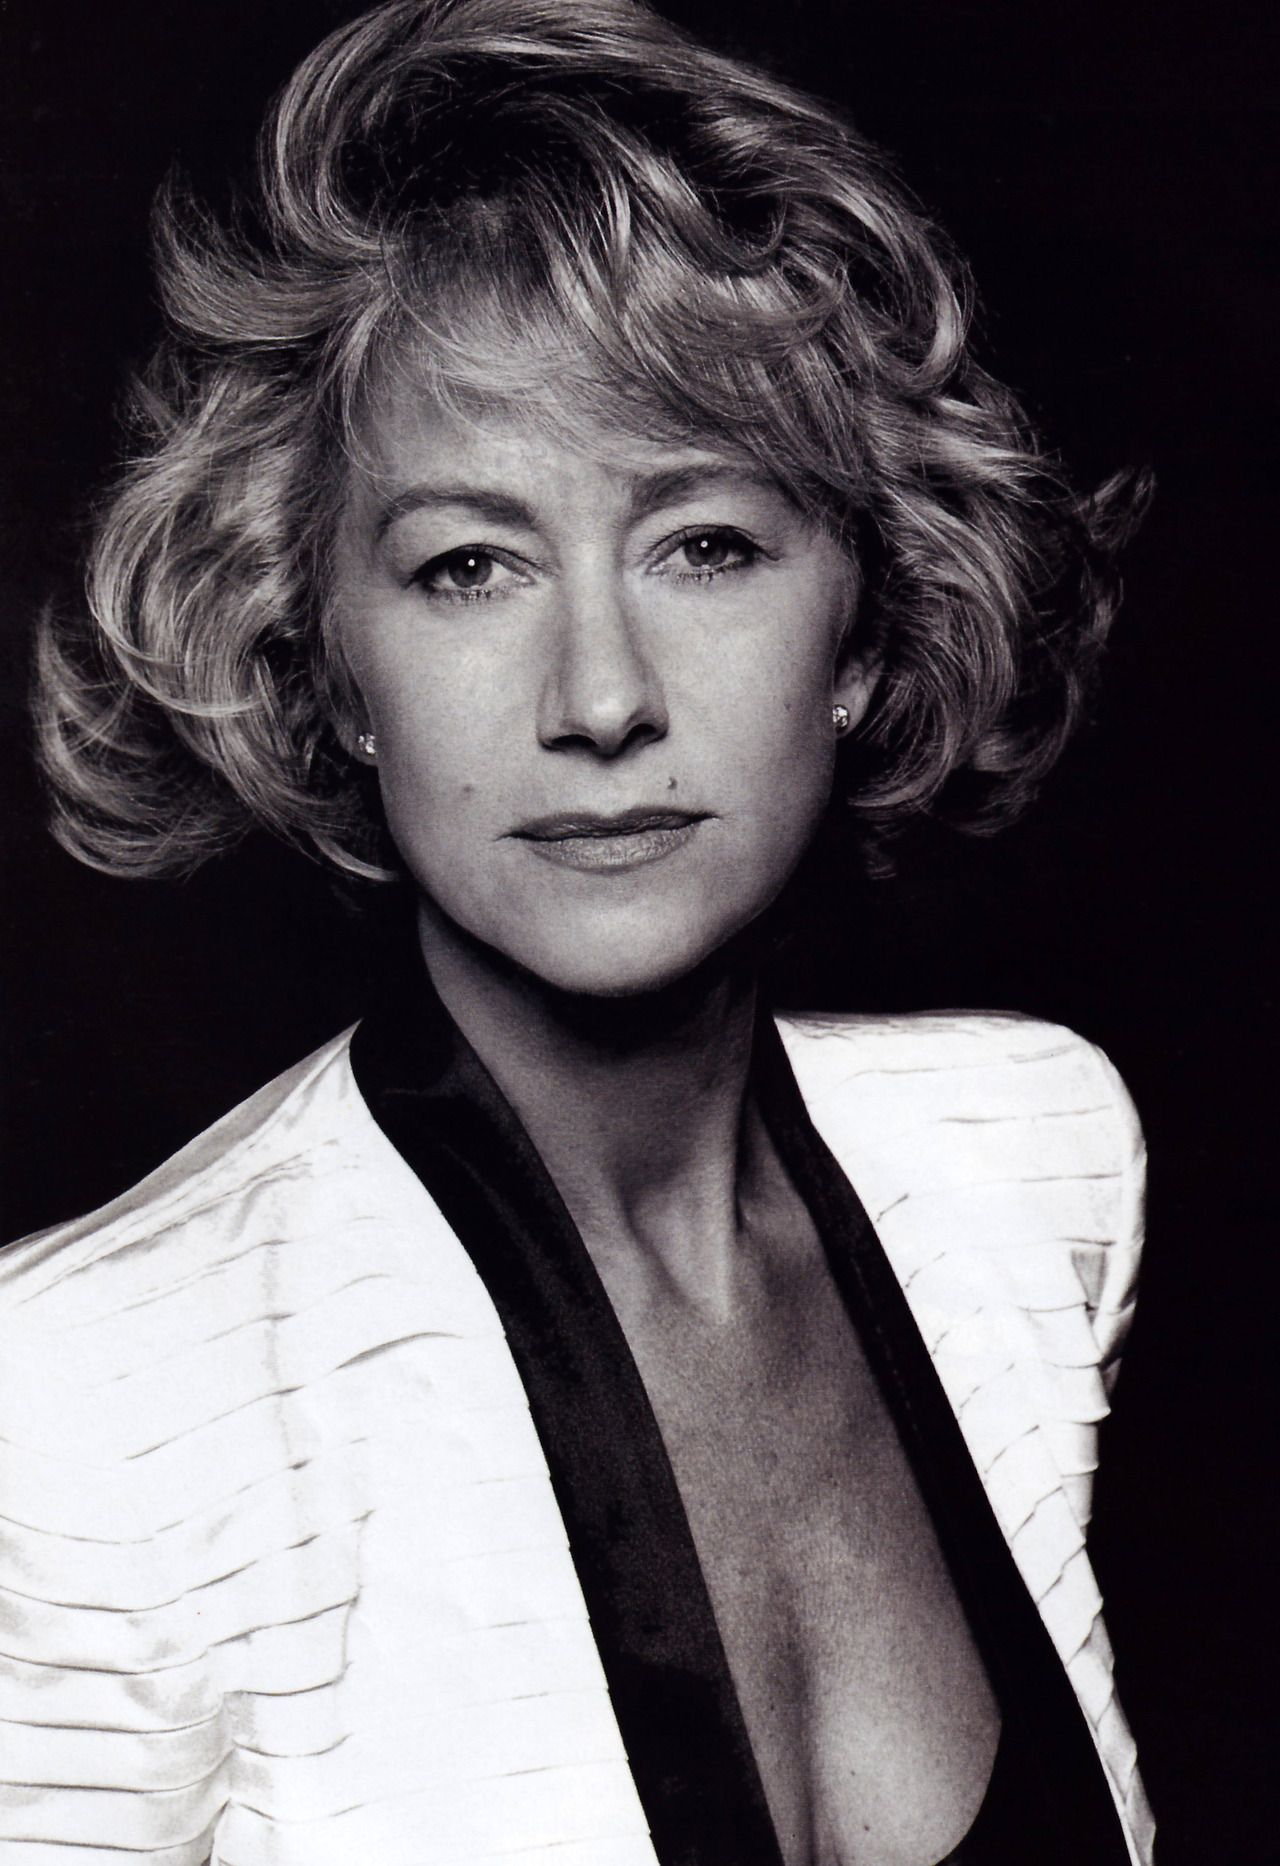 Ellen mirren photo 35